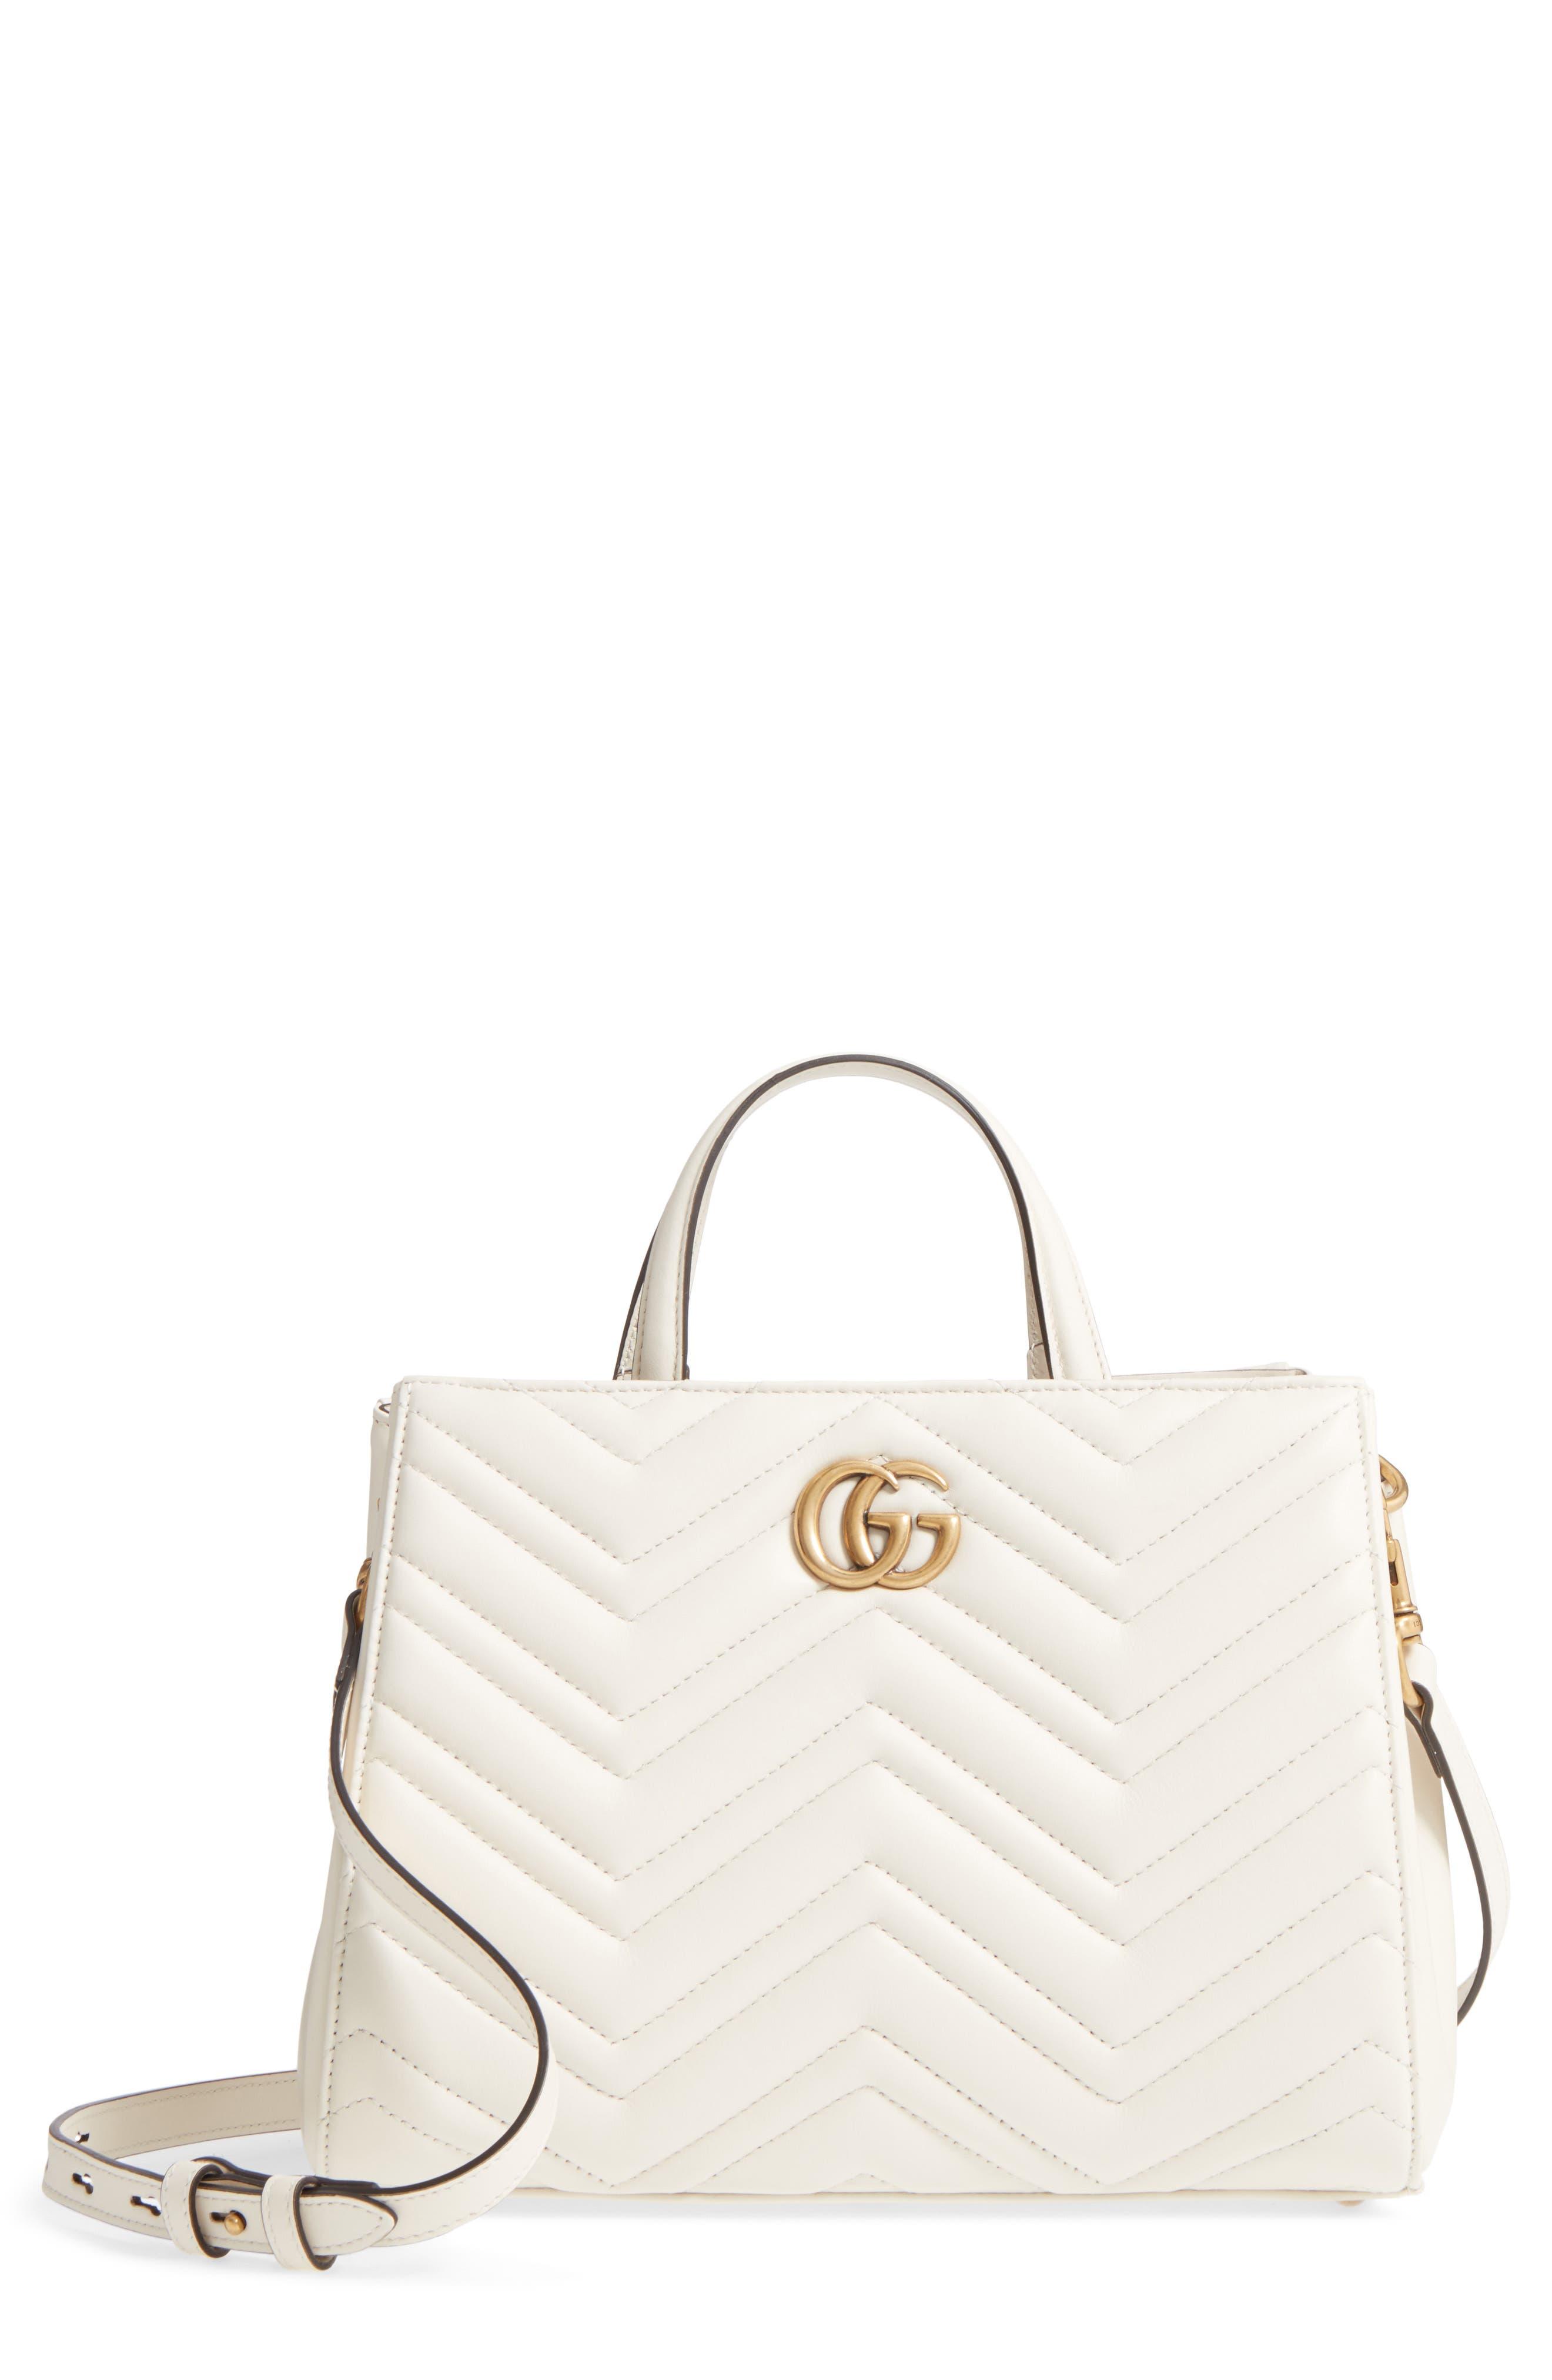 Main Image - Gucci GG Small Marmont 2.0 Matelassé Leather Top Handle Satchel